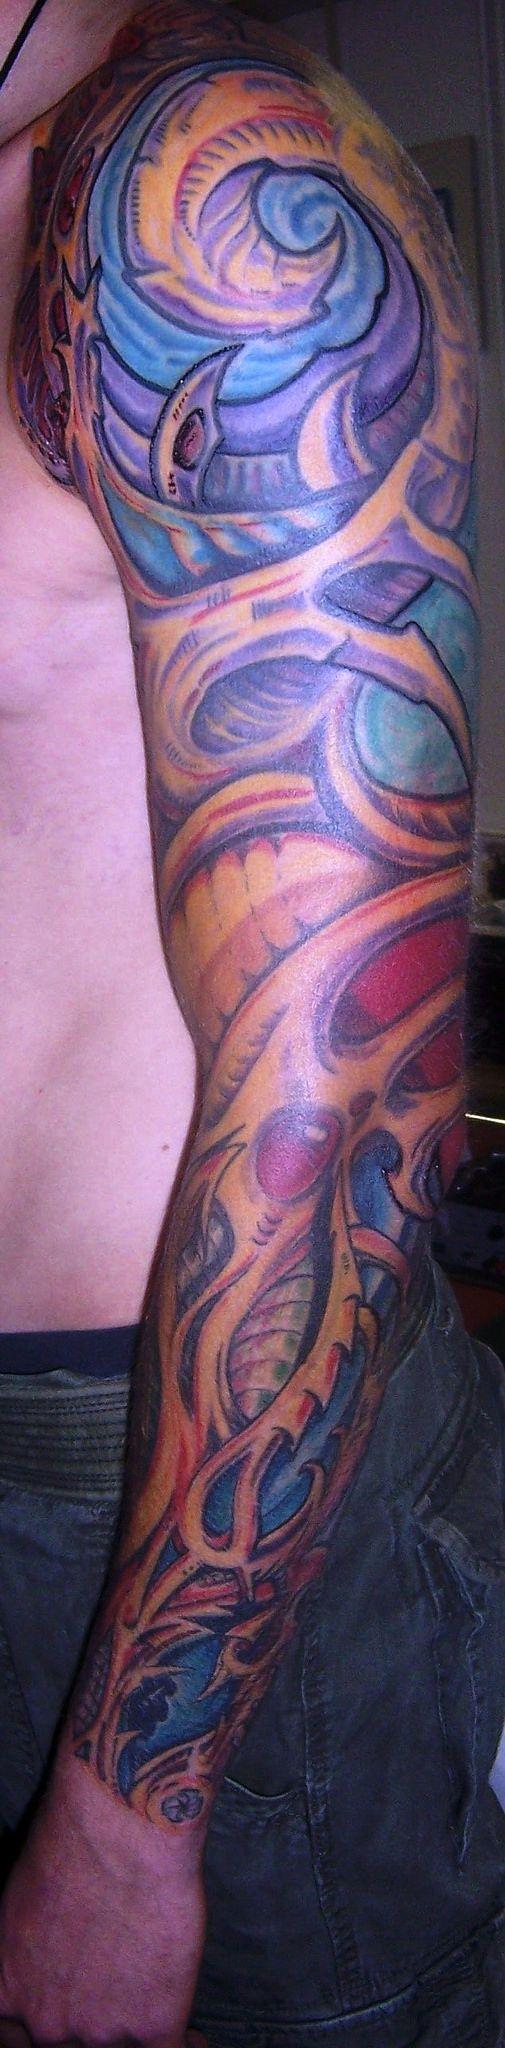 https://flic.kr/p/BALWce | Black and Grey Tattoo | black and grey tattoo, zwart grijs tattoos, Zwart en grijs tatoeages | www.popo-shoes.nl